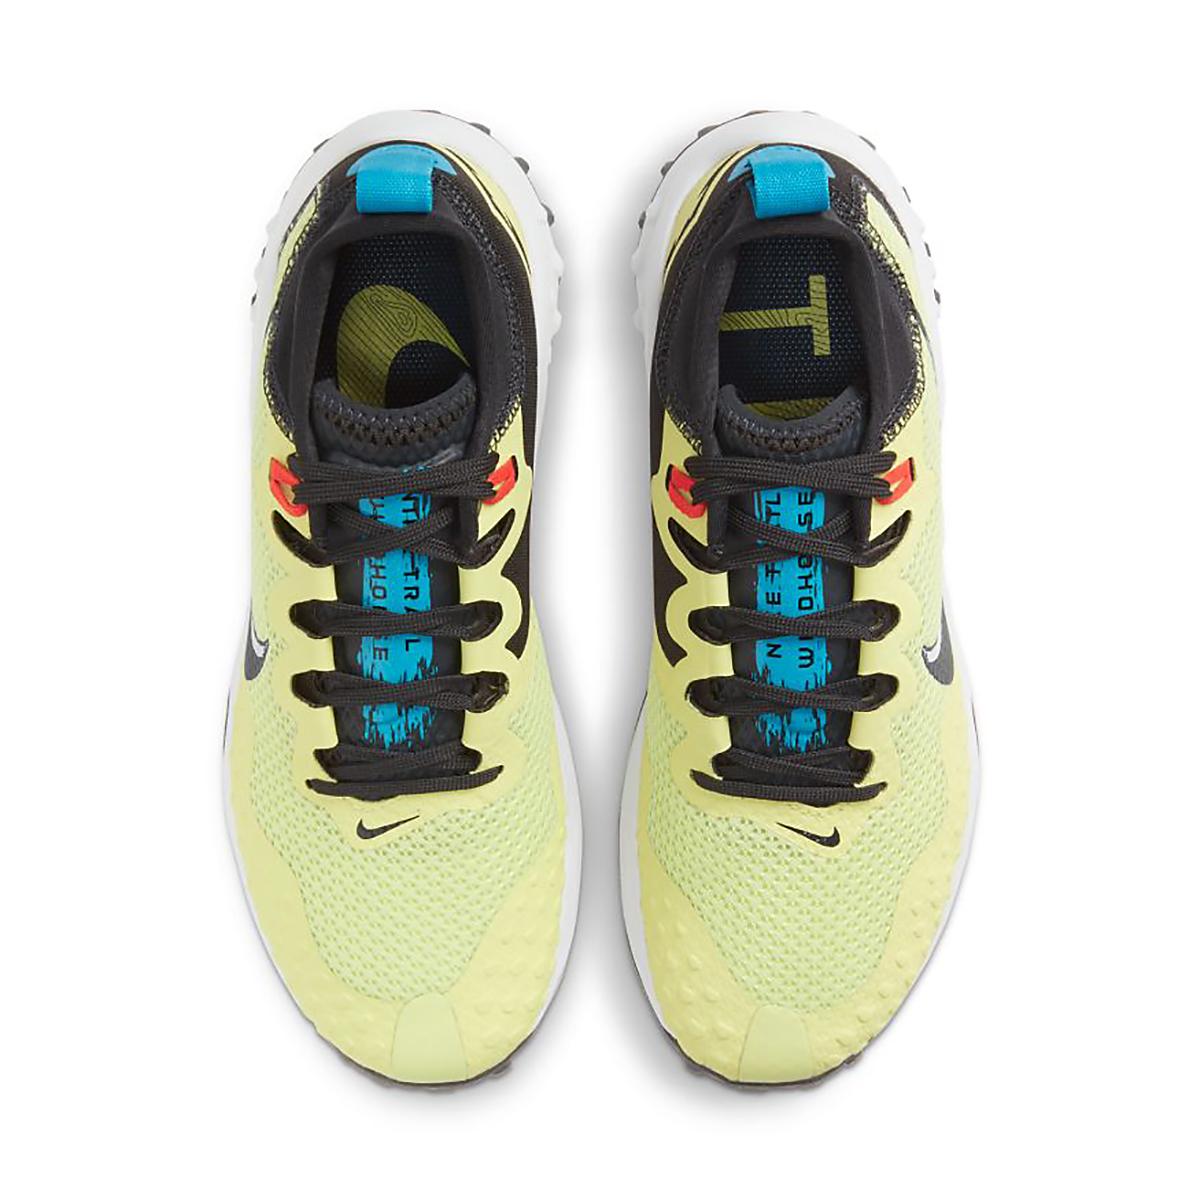 Women's Nike Wildhorse 7 Trail Running Shoe - Color: Limelight/Off Noir-Laser Blue-Chile Red - Size: 5 - Width: Regular, Limelight/Off Noir-Laser Blue-Chile Red, large, image 3